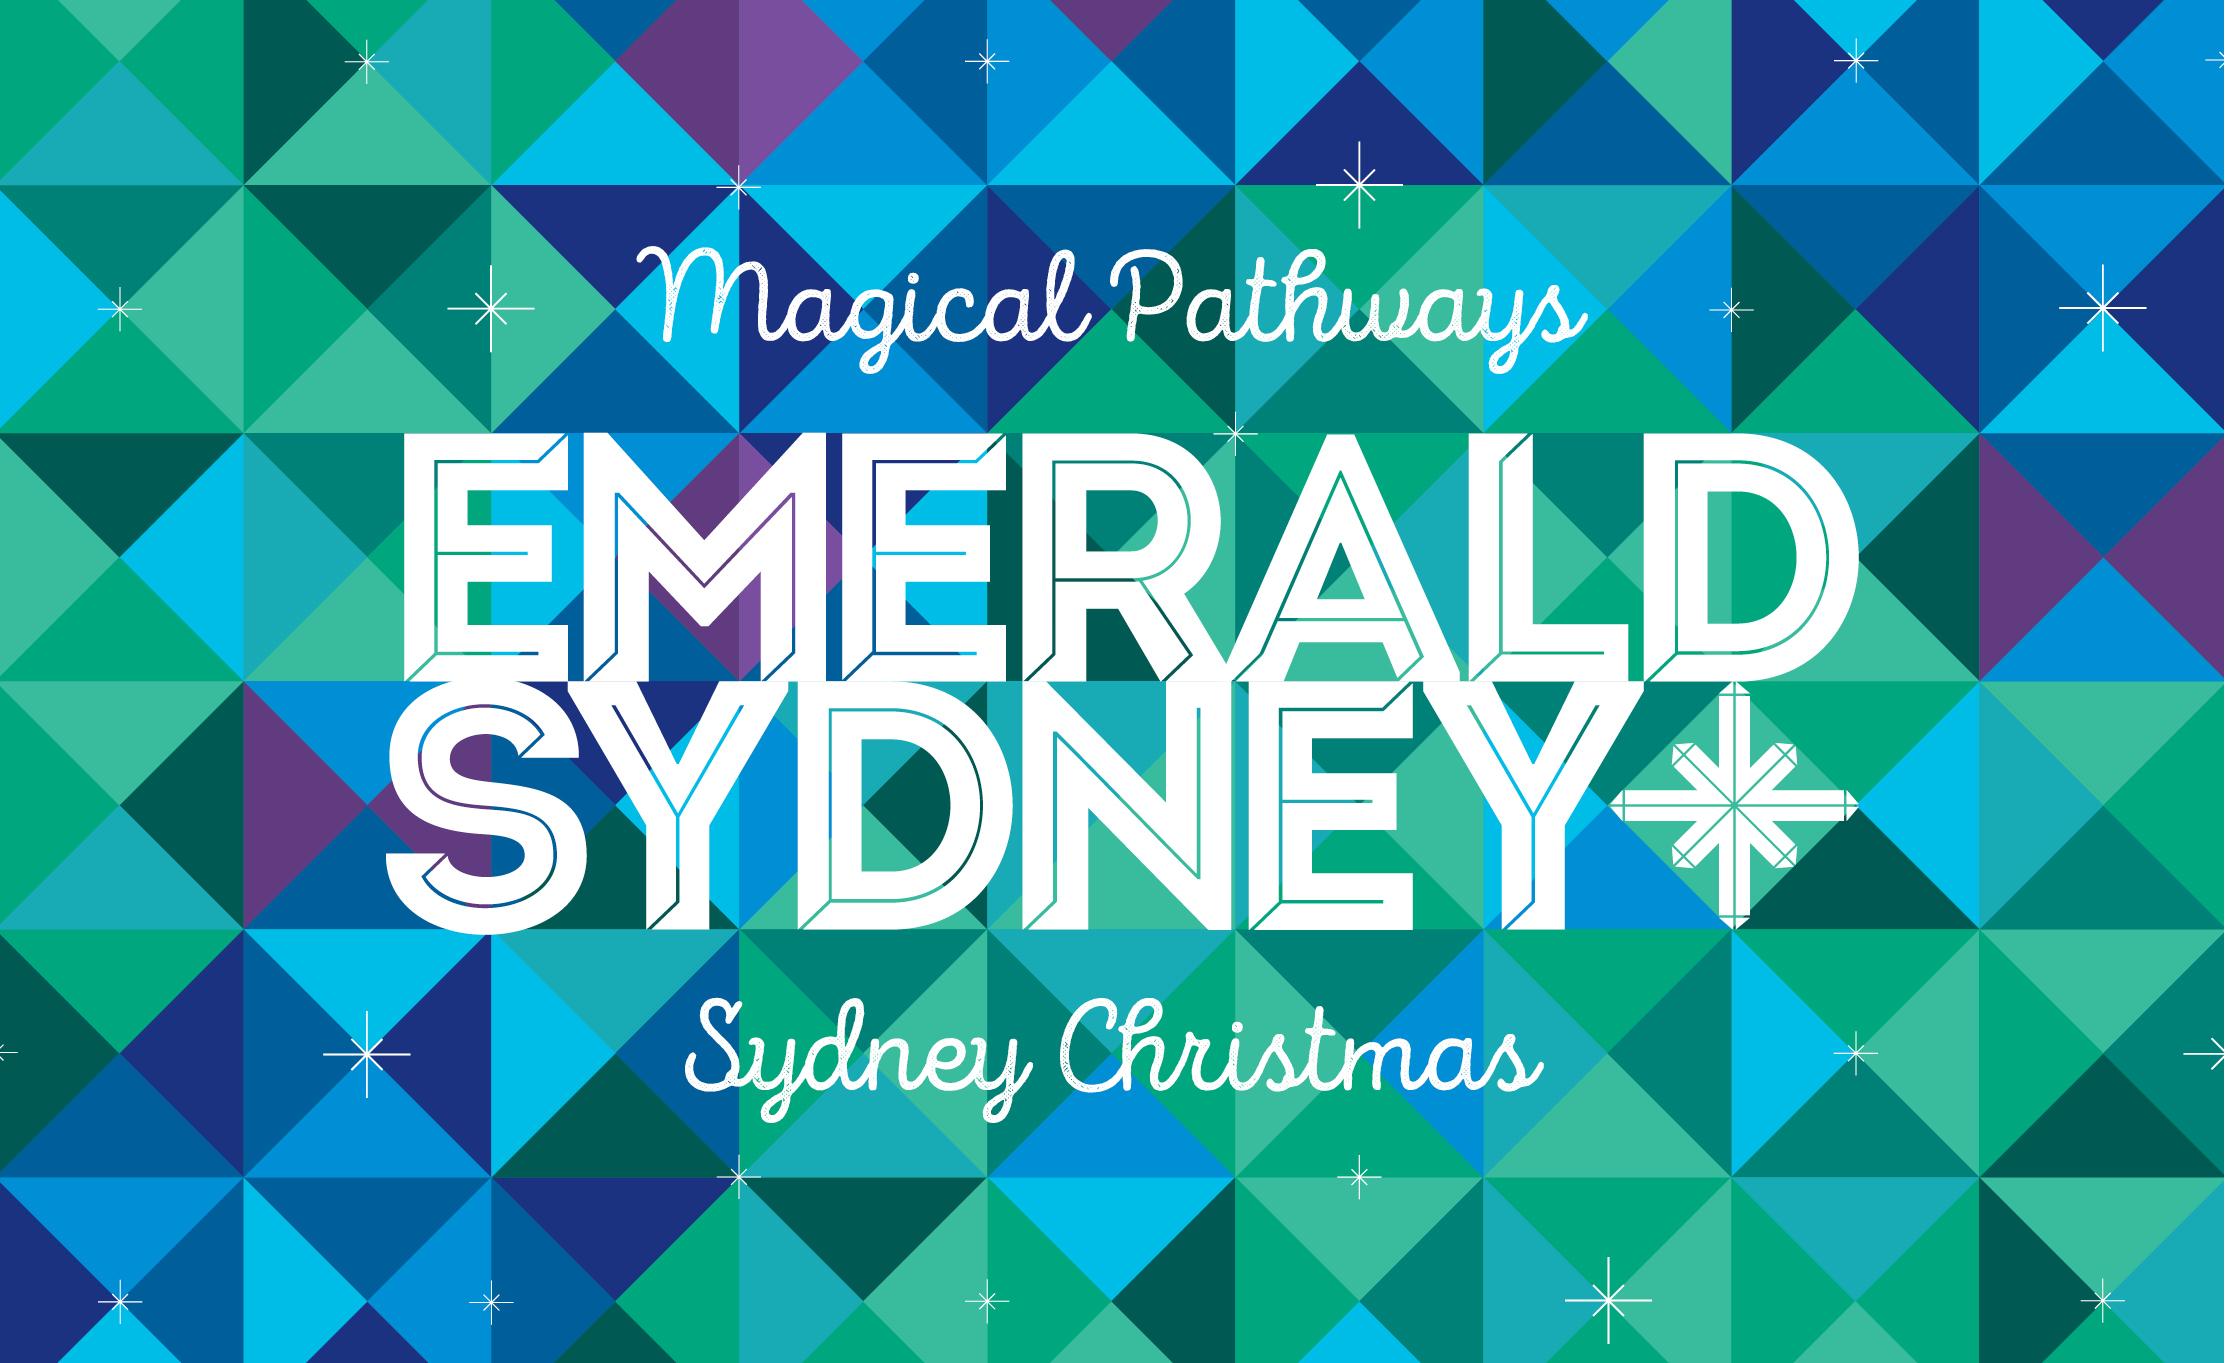 Emerald Sydney.jpg